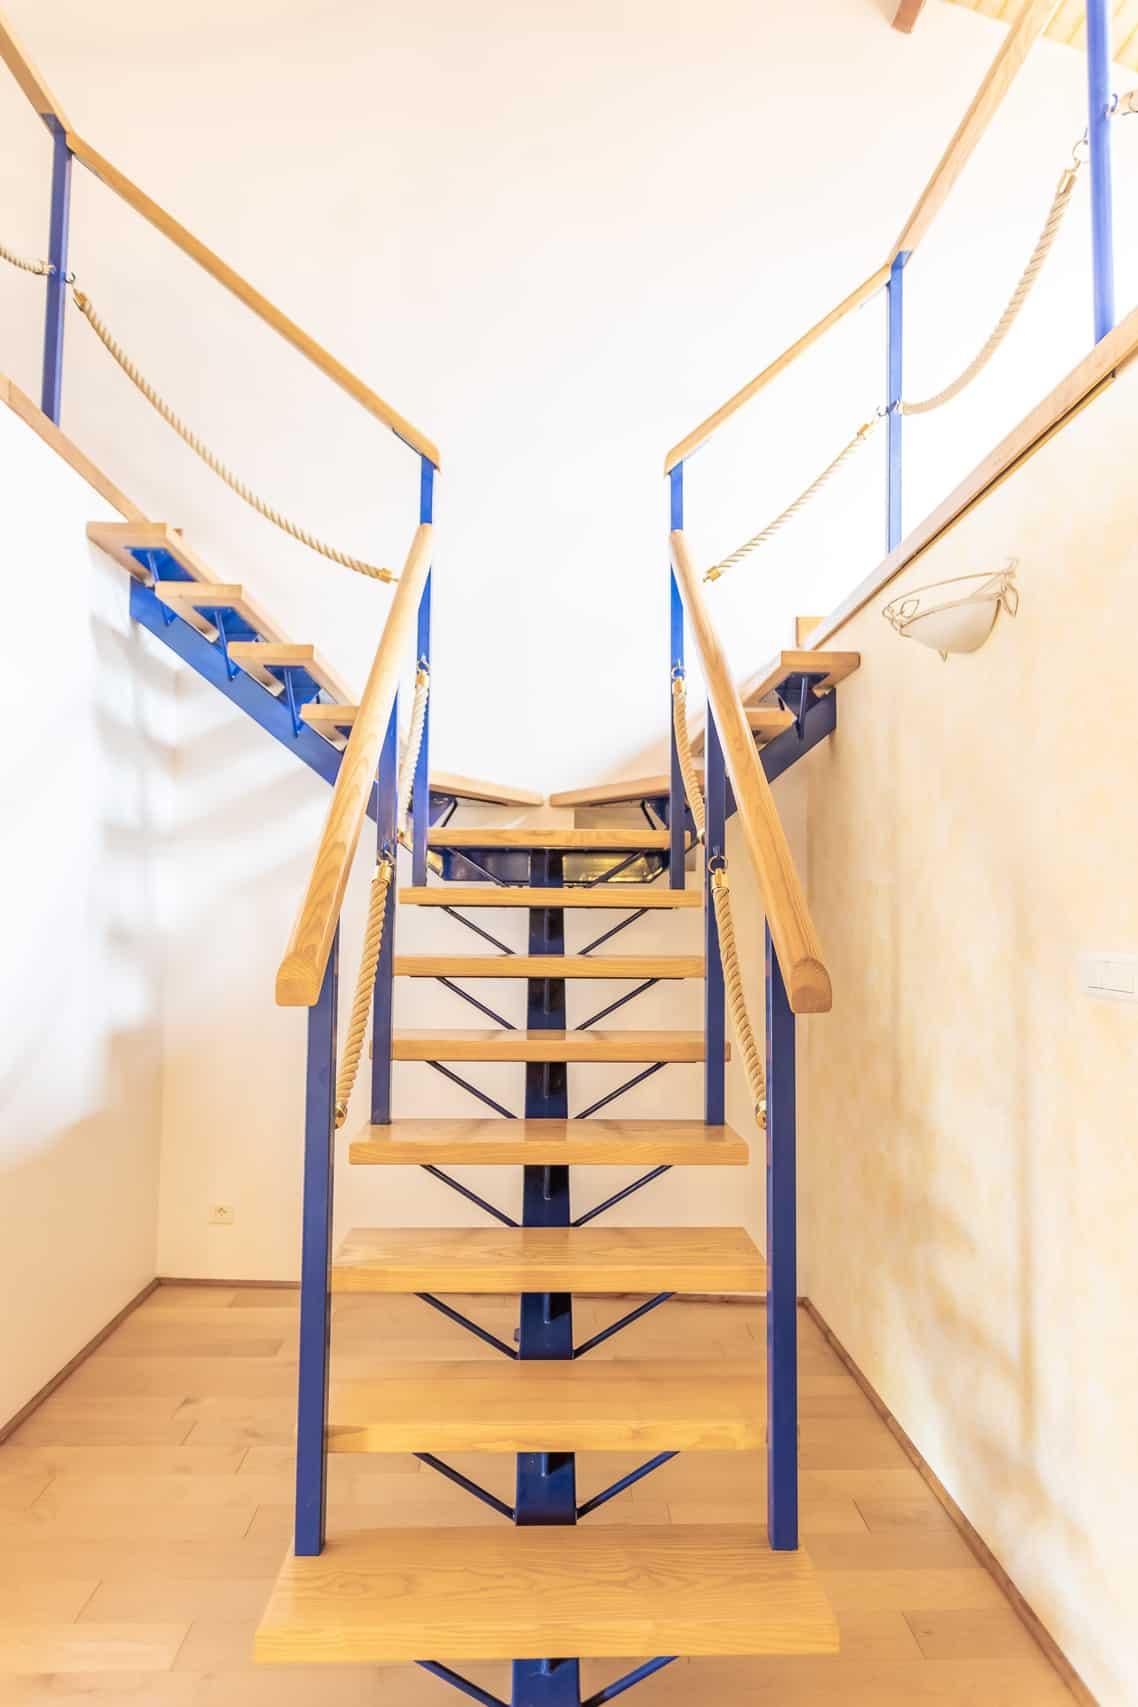 Staircase-WMC017